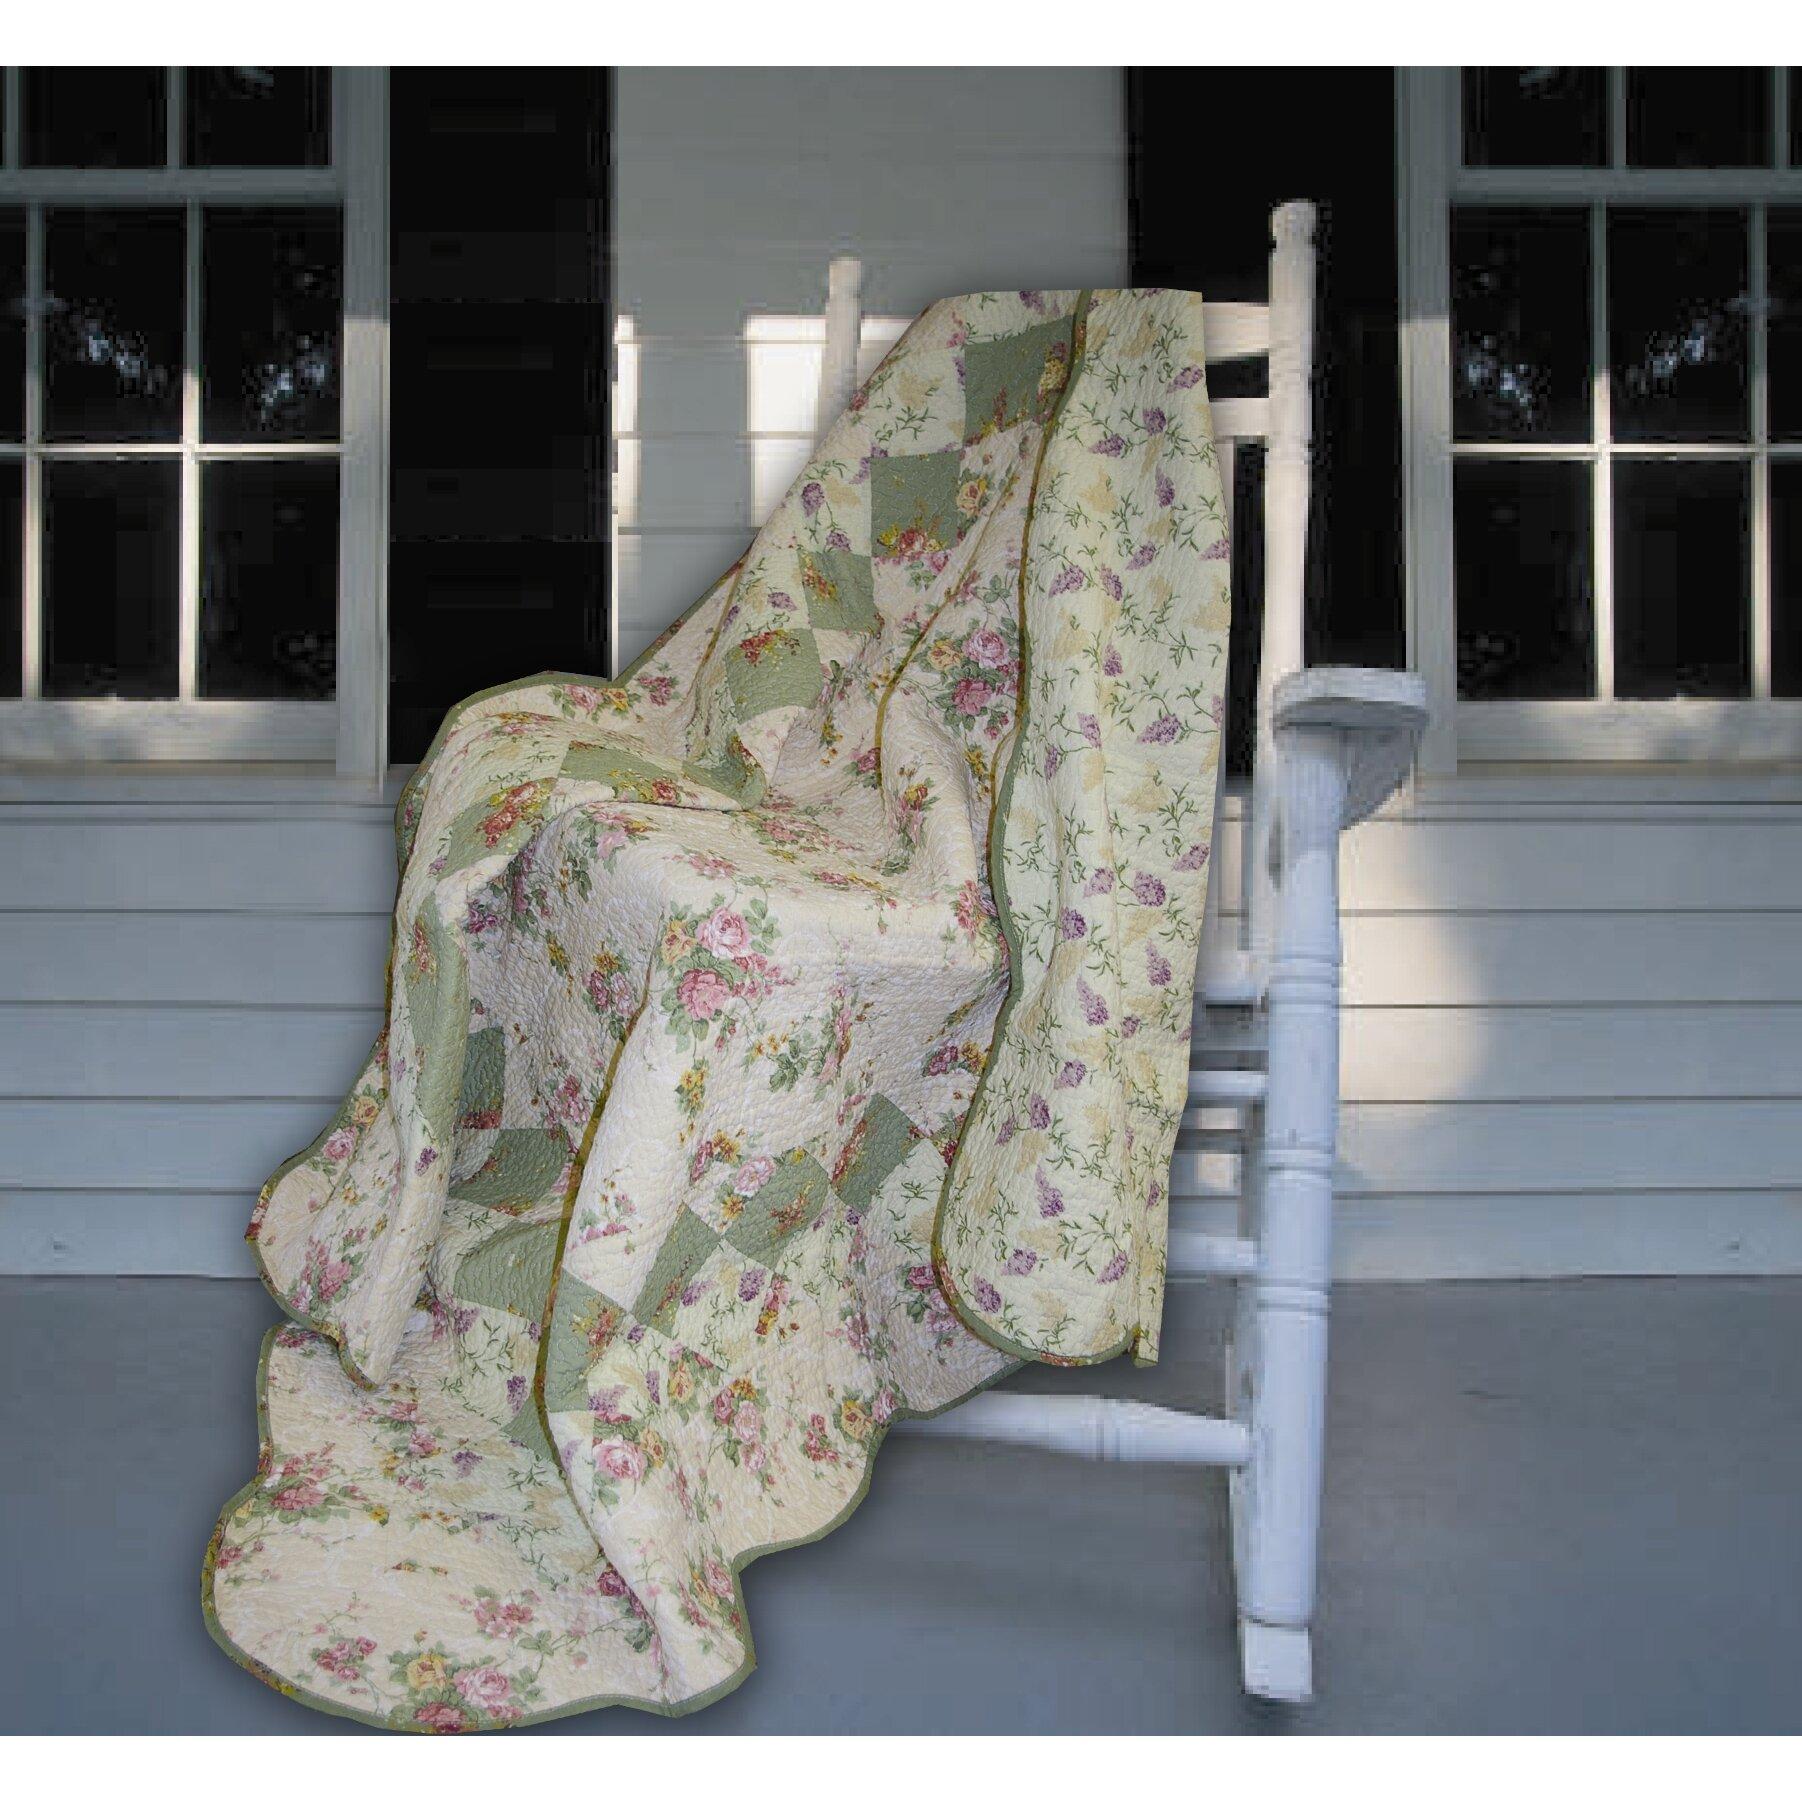 Greenland Home Fashions Bliss Cotton Throw Reviews Wayfair